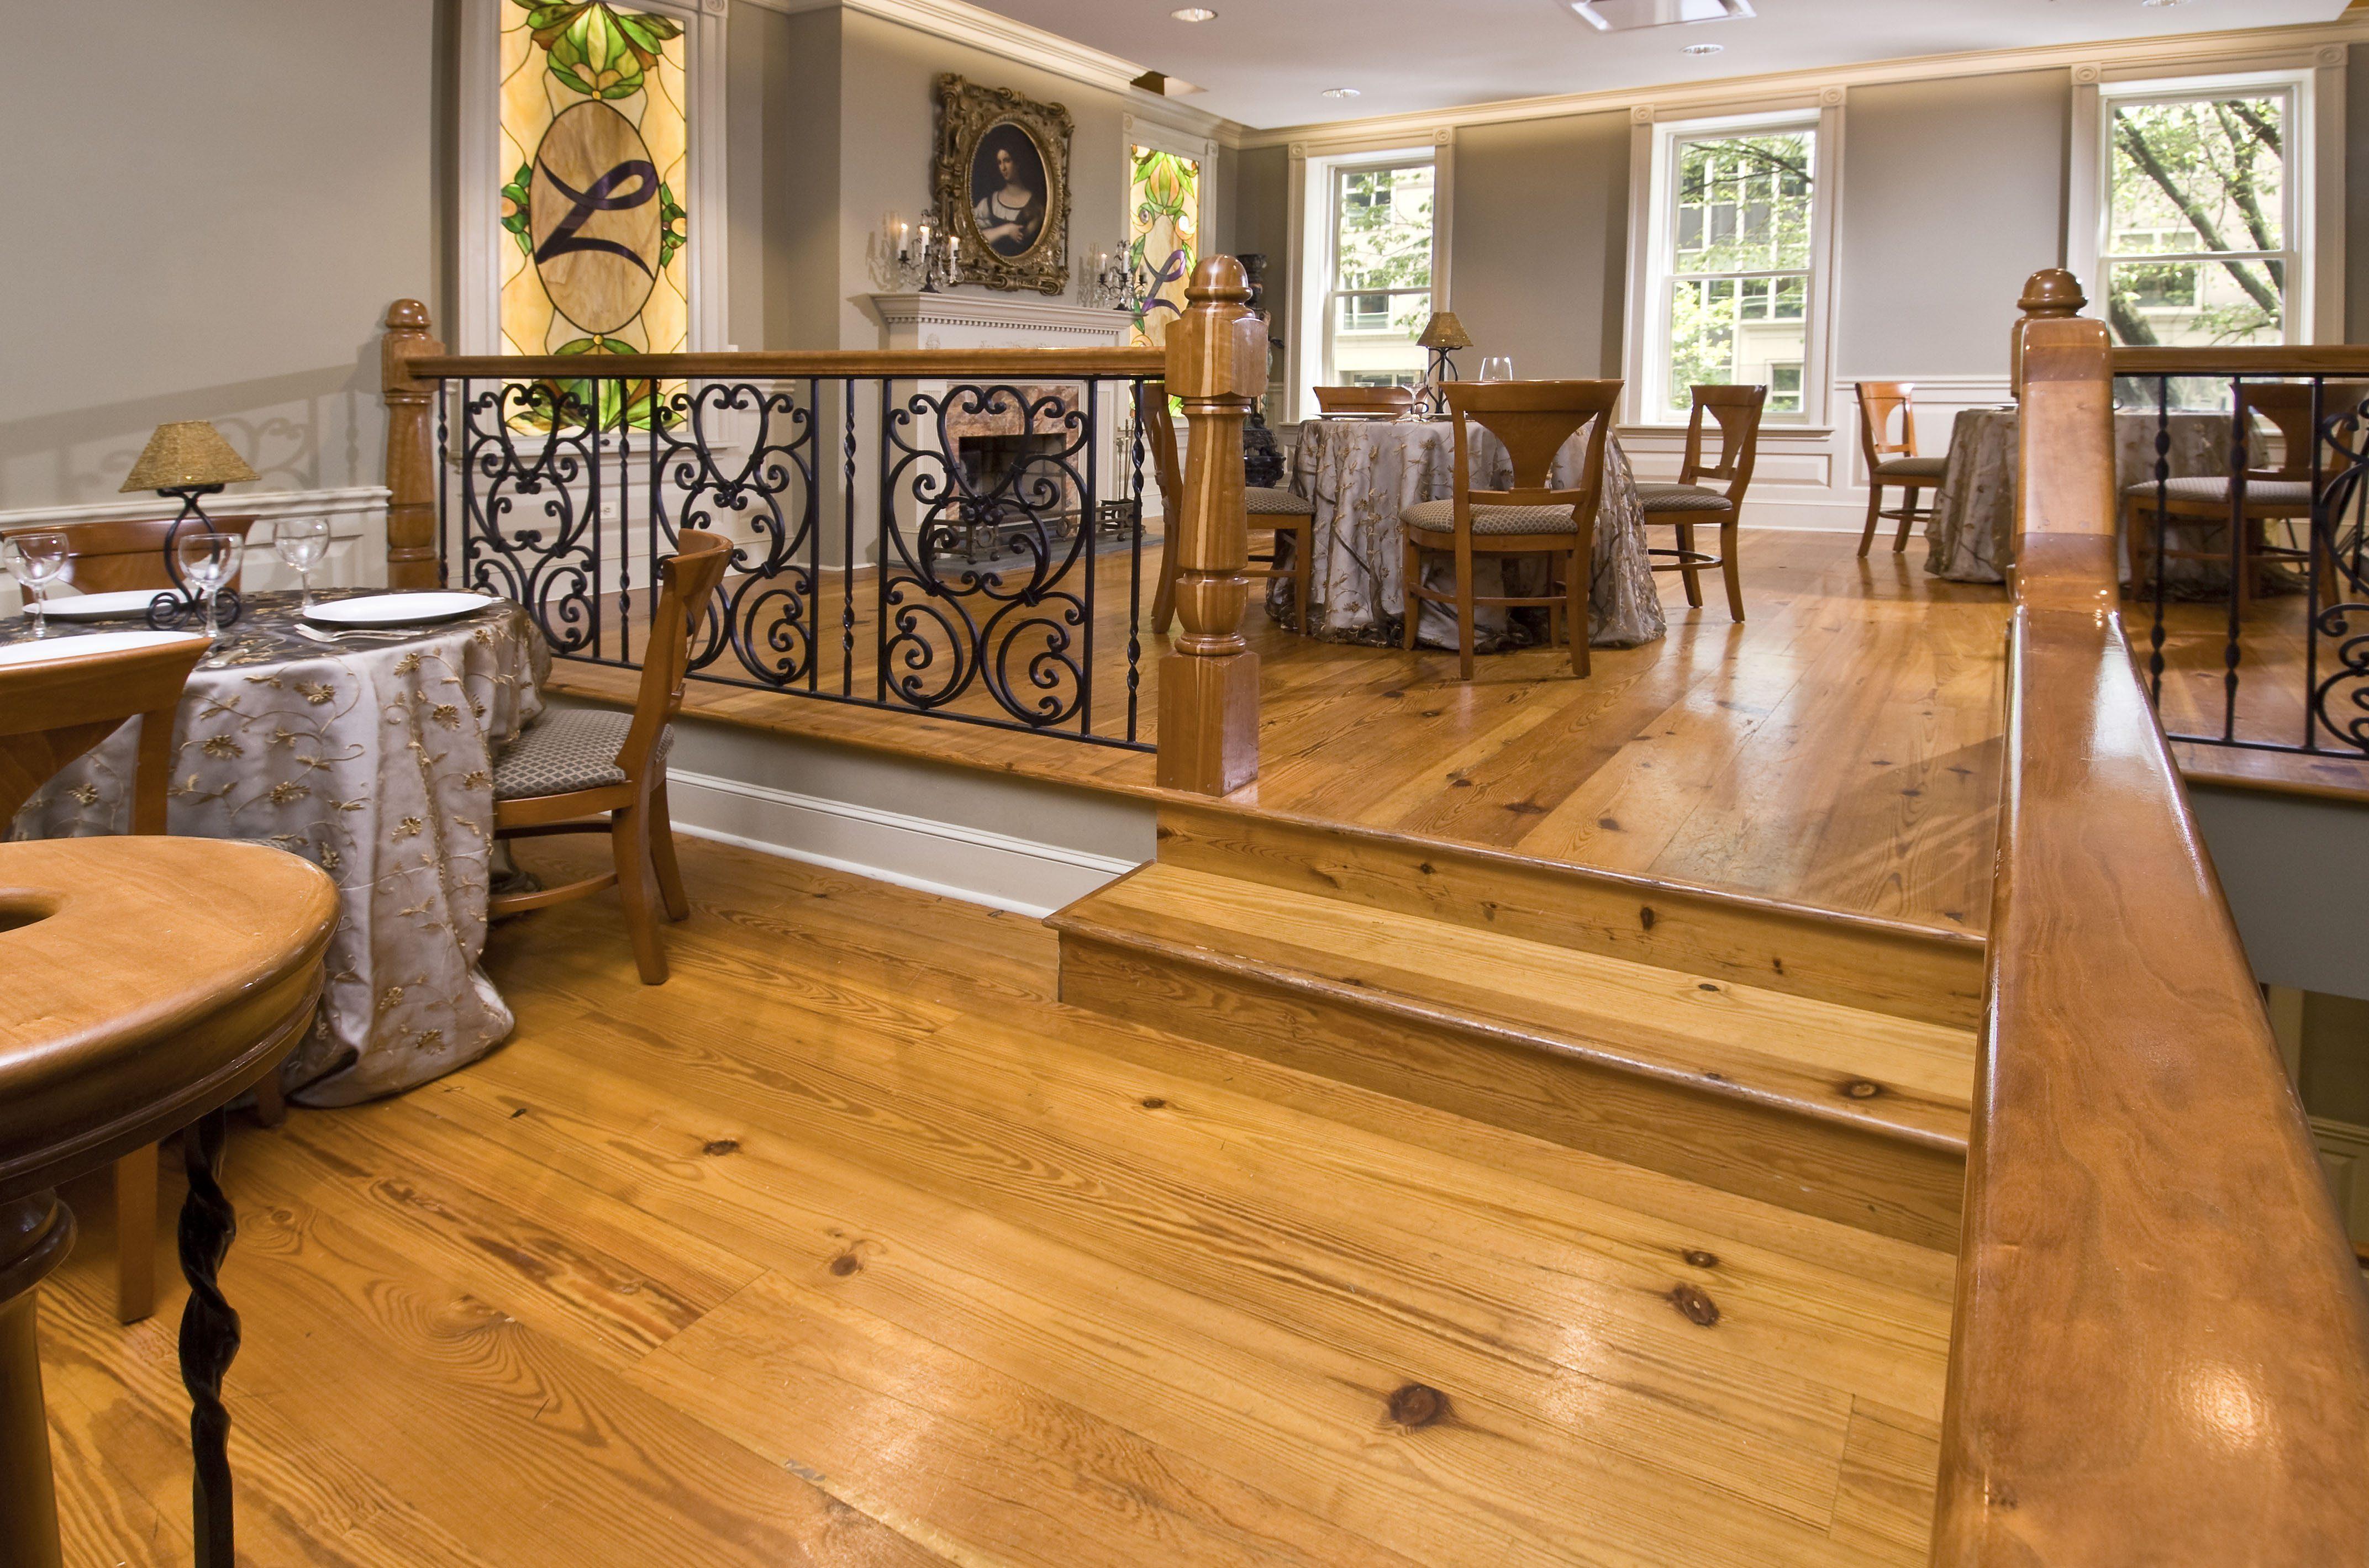 Reclaimed Heart Pine Flooring in Commercial Dining Room